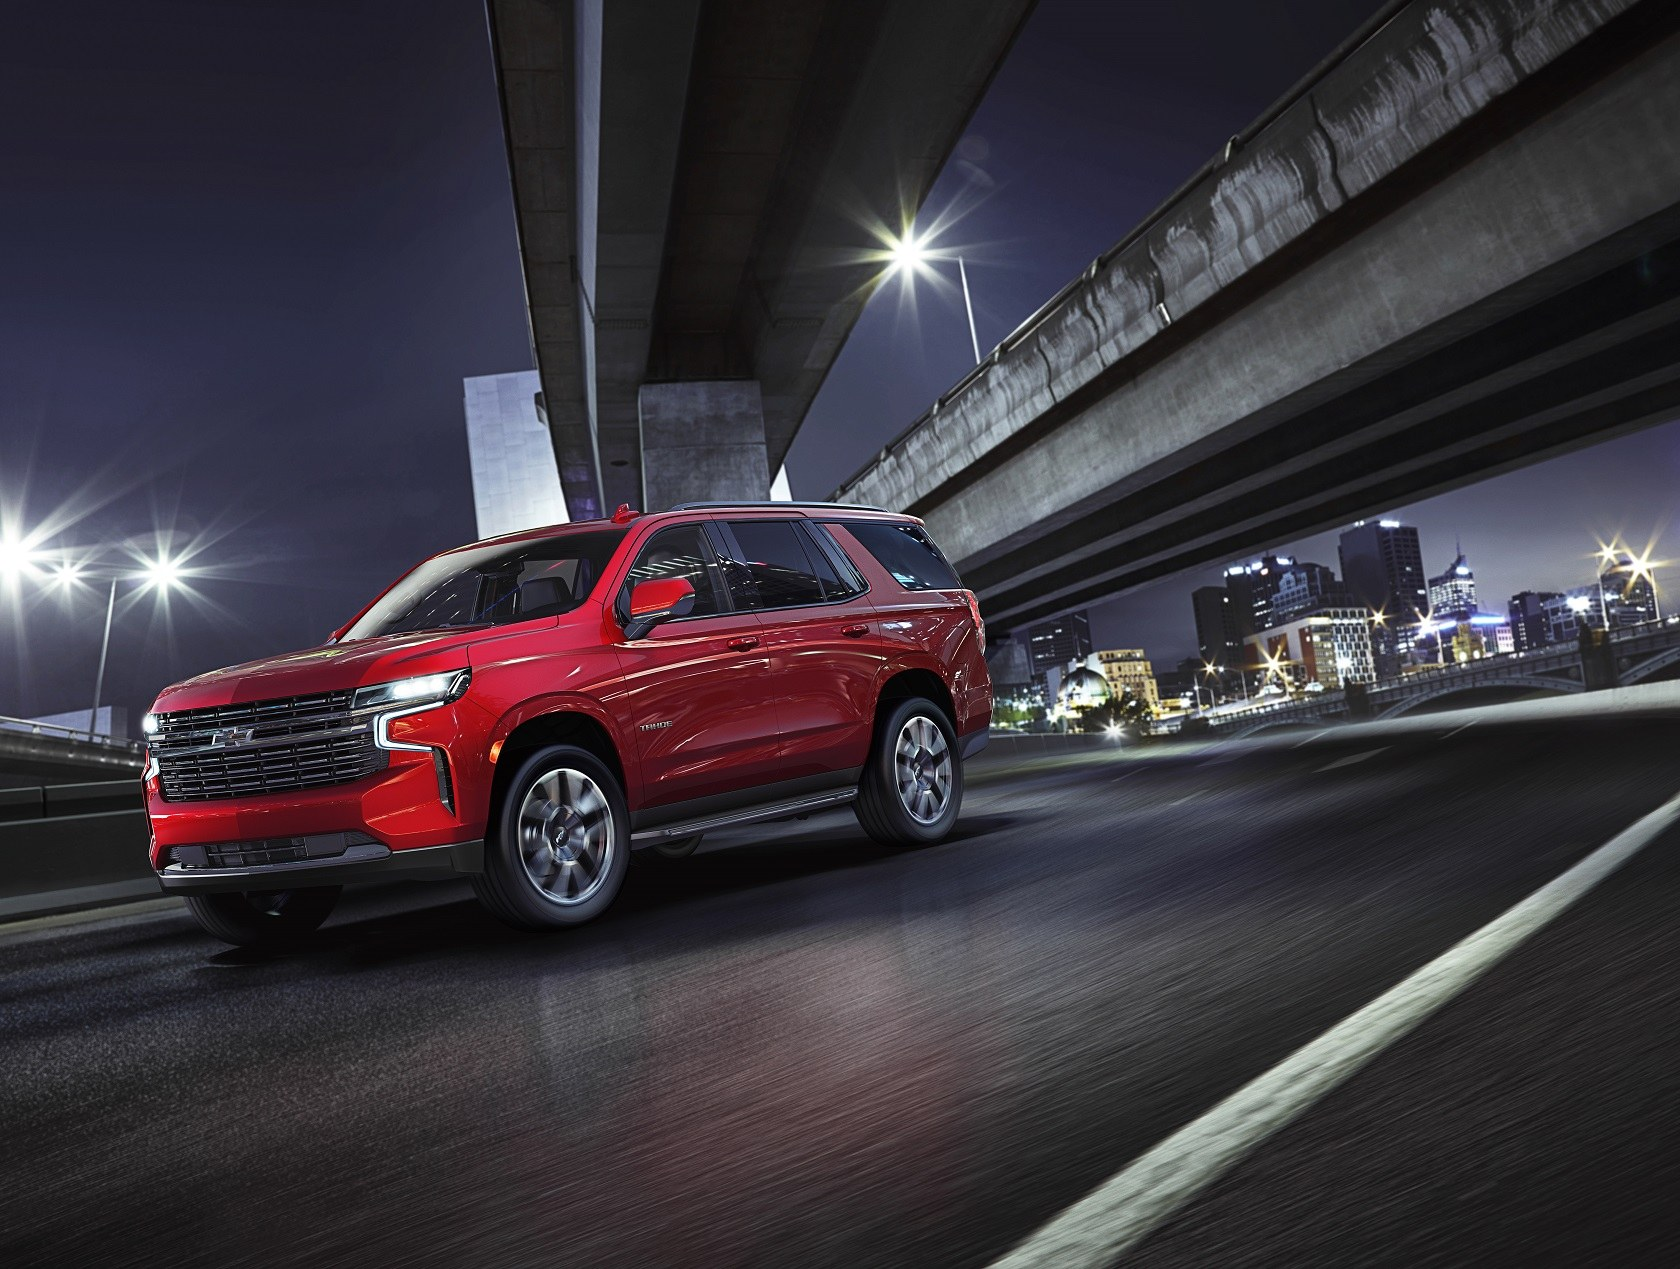 2021 Chevrolet Tahoe & Suburban Revealed - Eagle Ridge GM